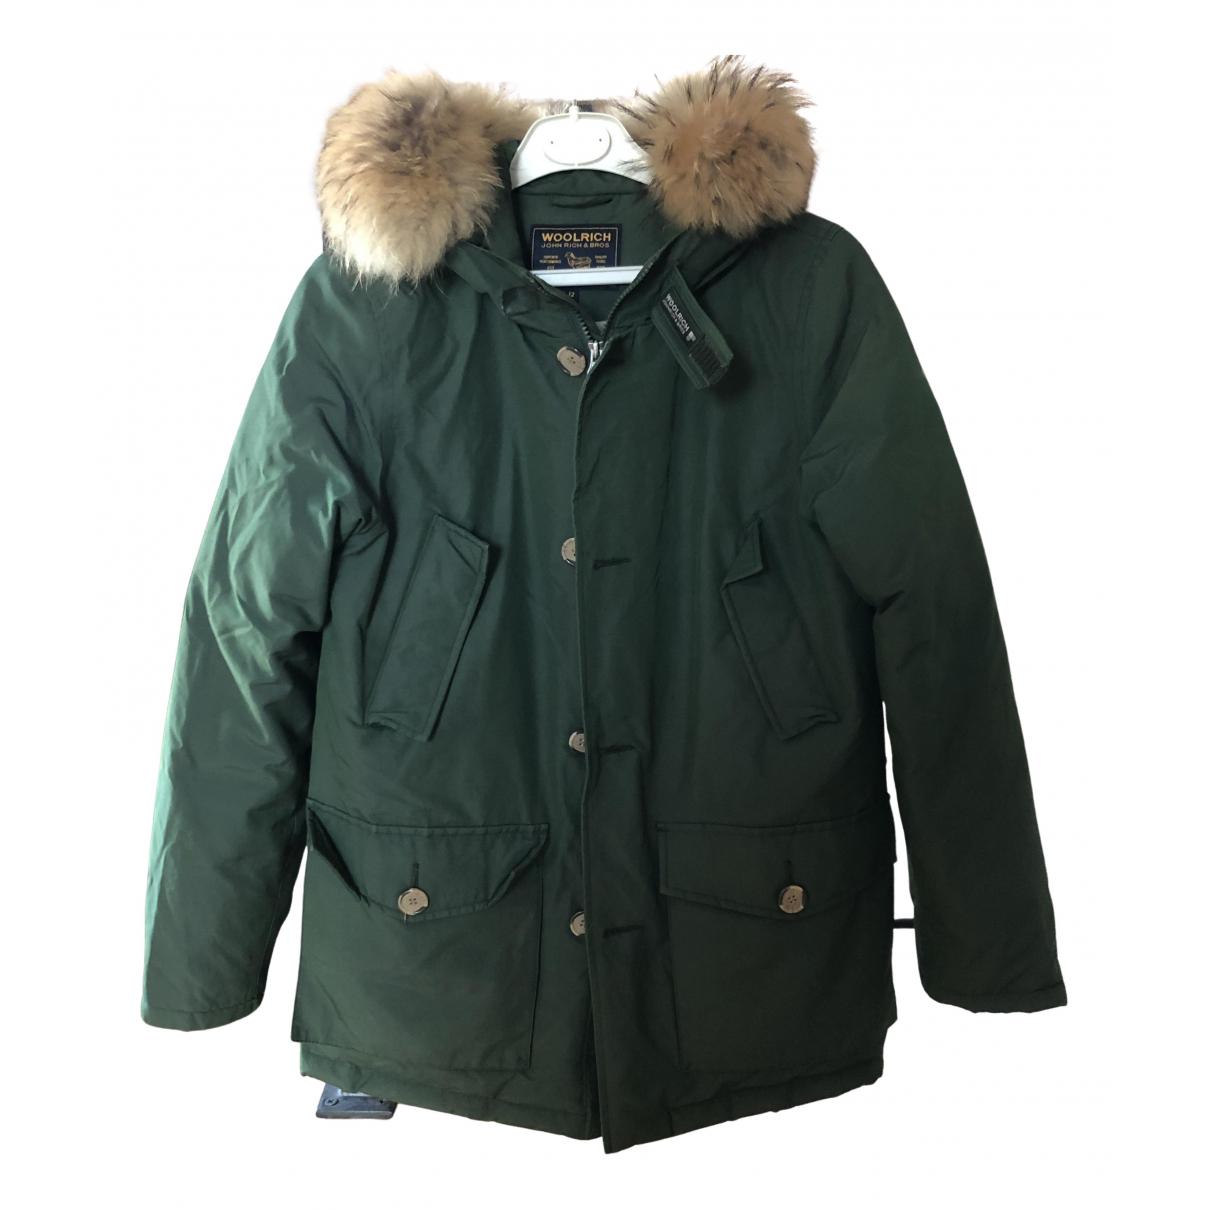 Woolrich N Green Fur jacket & coat for Kids 12 years - XS UK